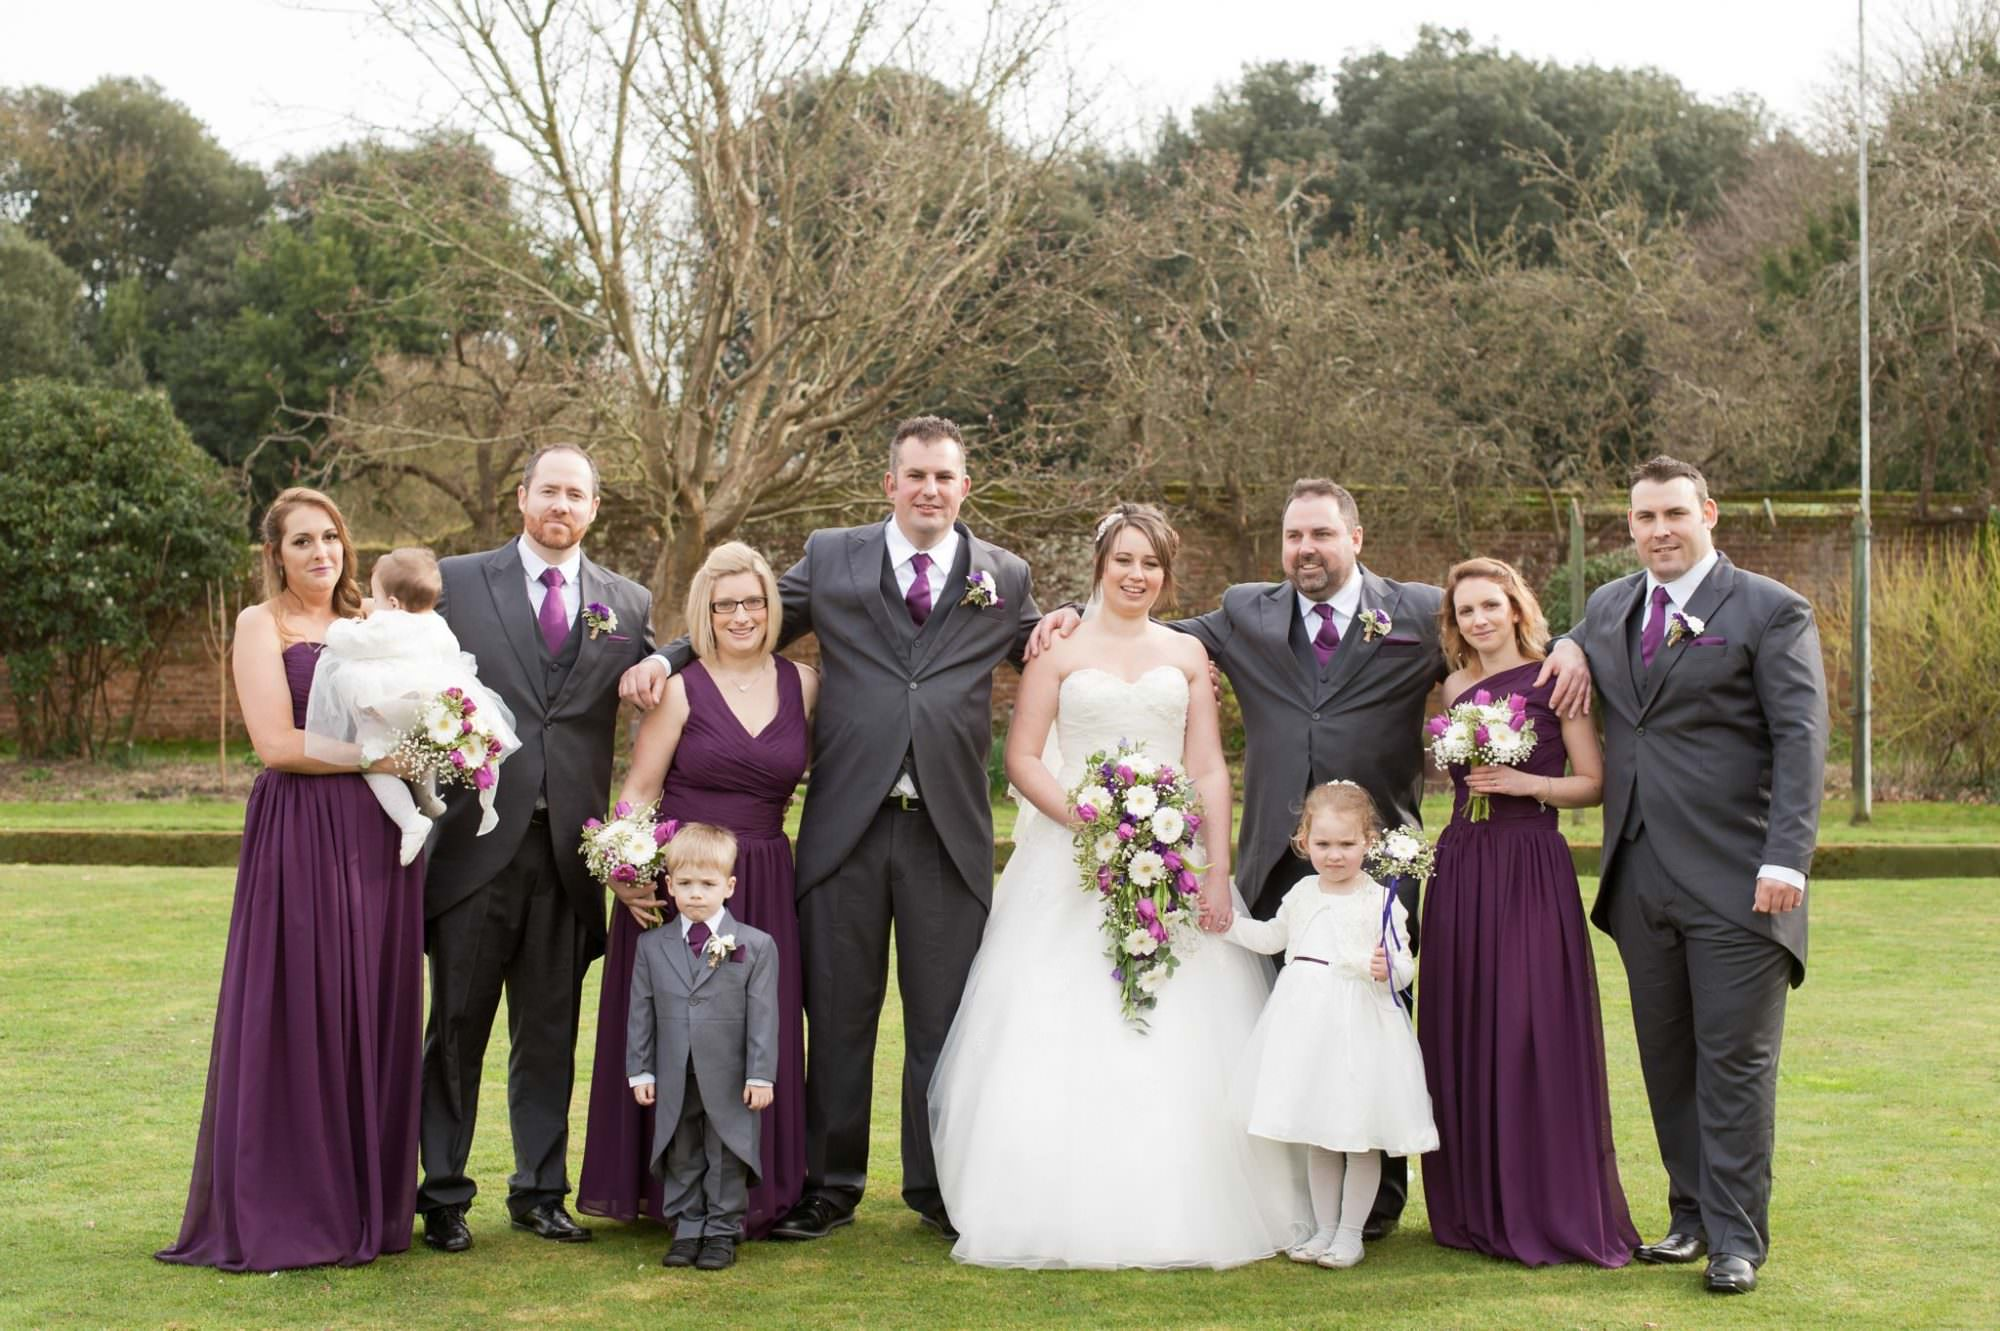 Bridal party at Kings Arms Hotel Wedding